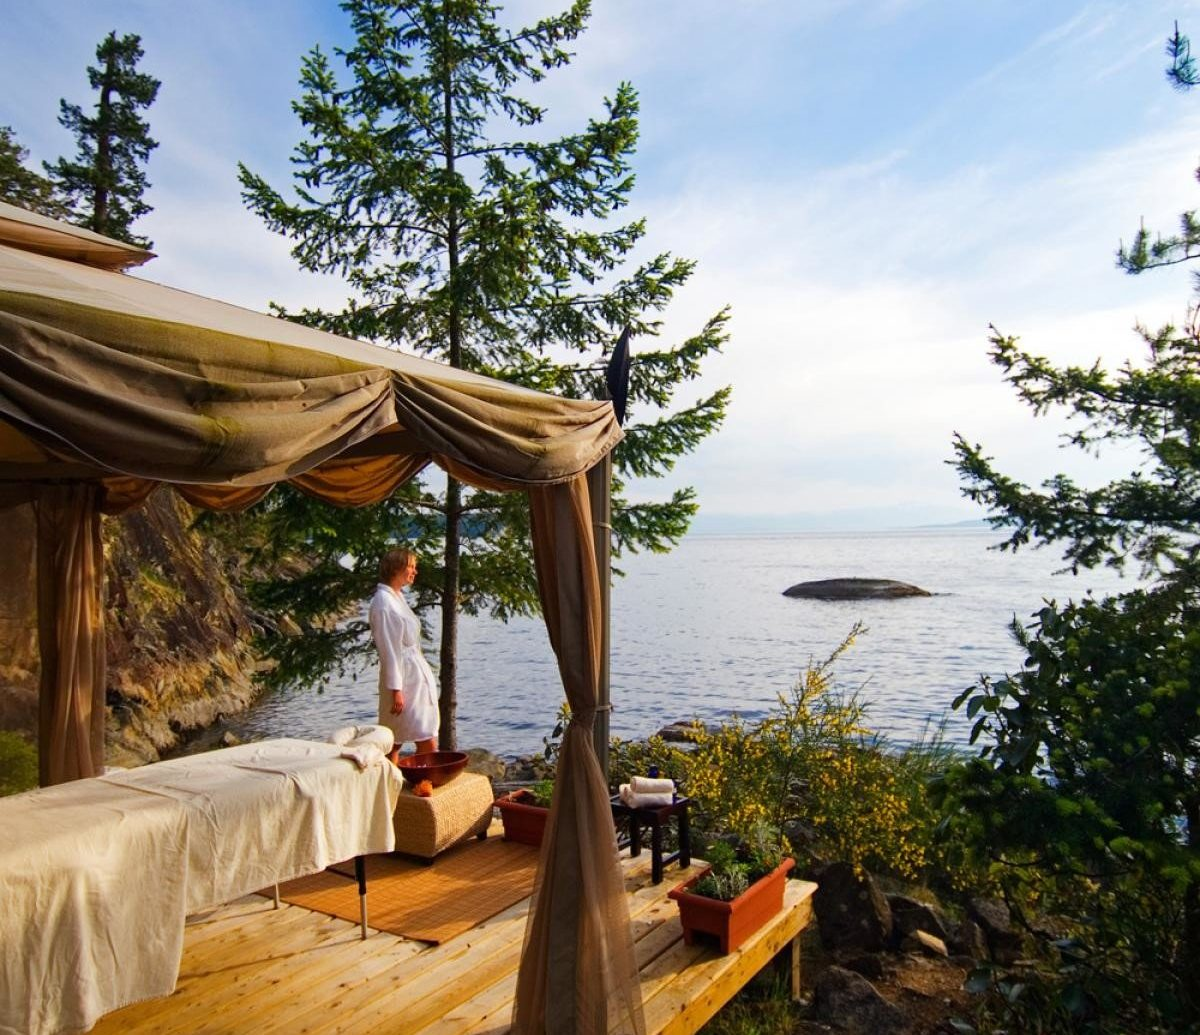 Glamping Outdoors + Adventure Trip Ideas tree outdoor sky vacation estate Resort